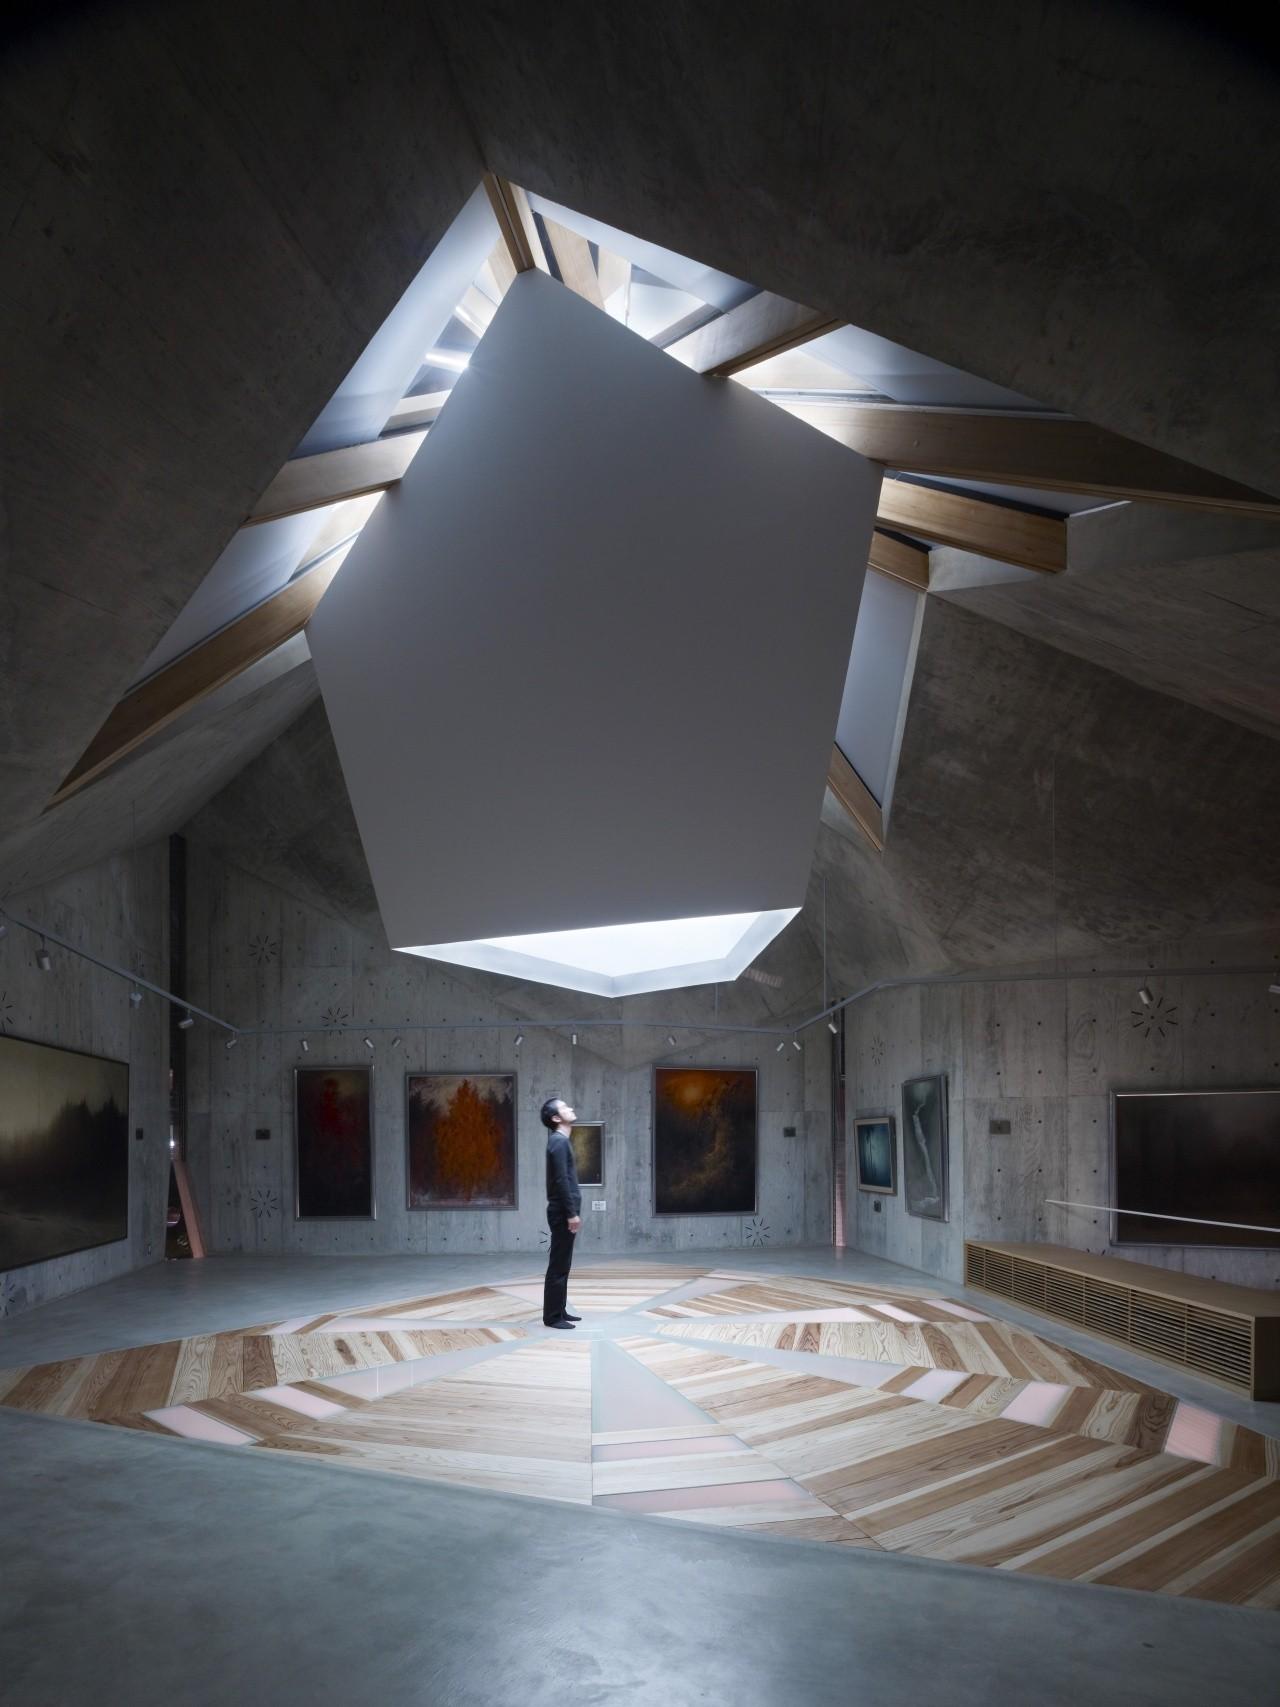 Mecenat Art Museum Naf Architect & Design - 34